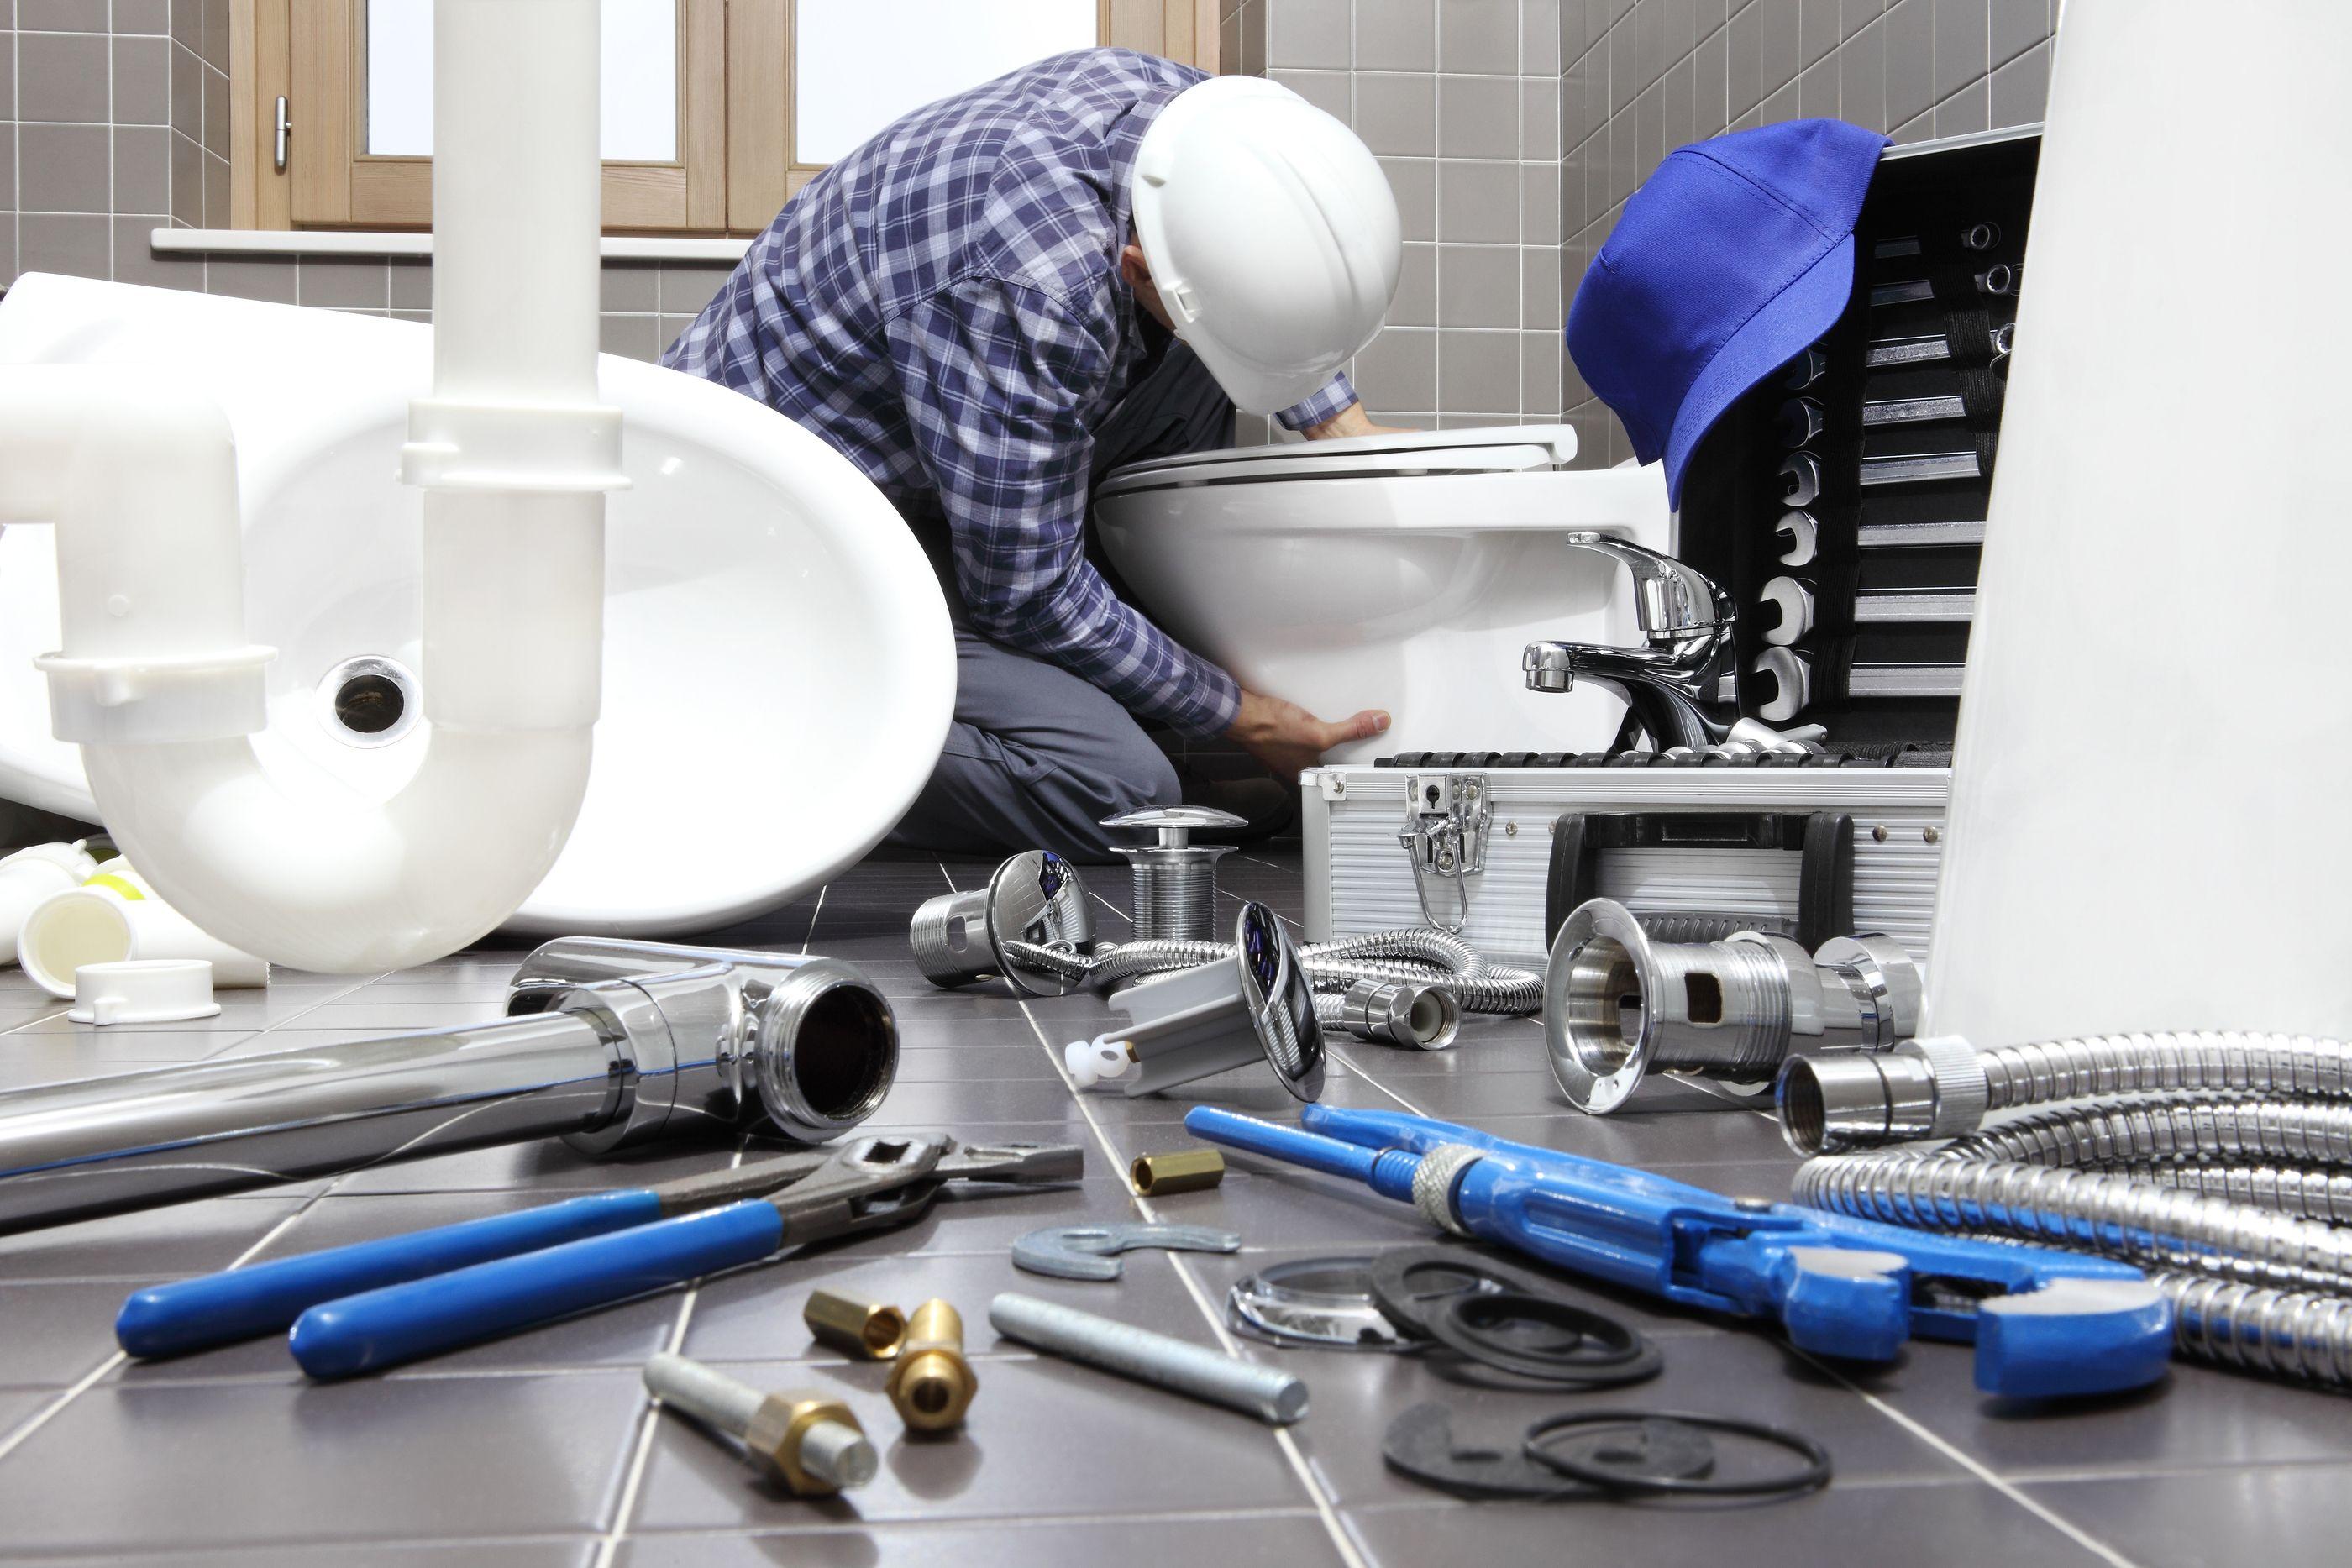 The plumbing management industry is seeing stifling